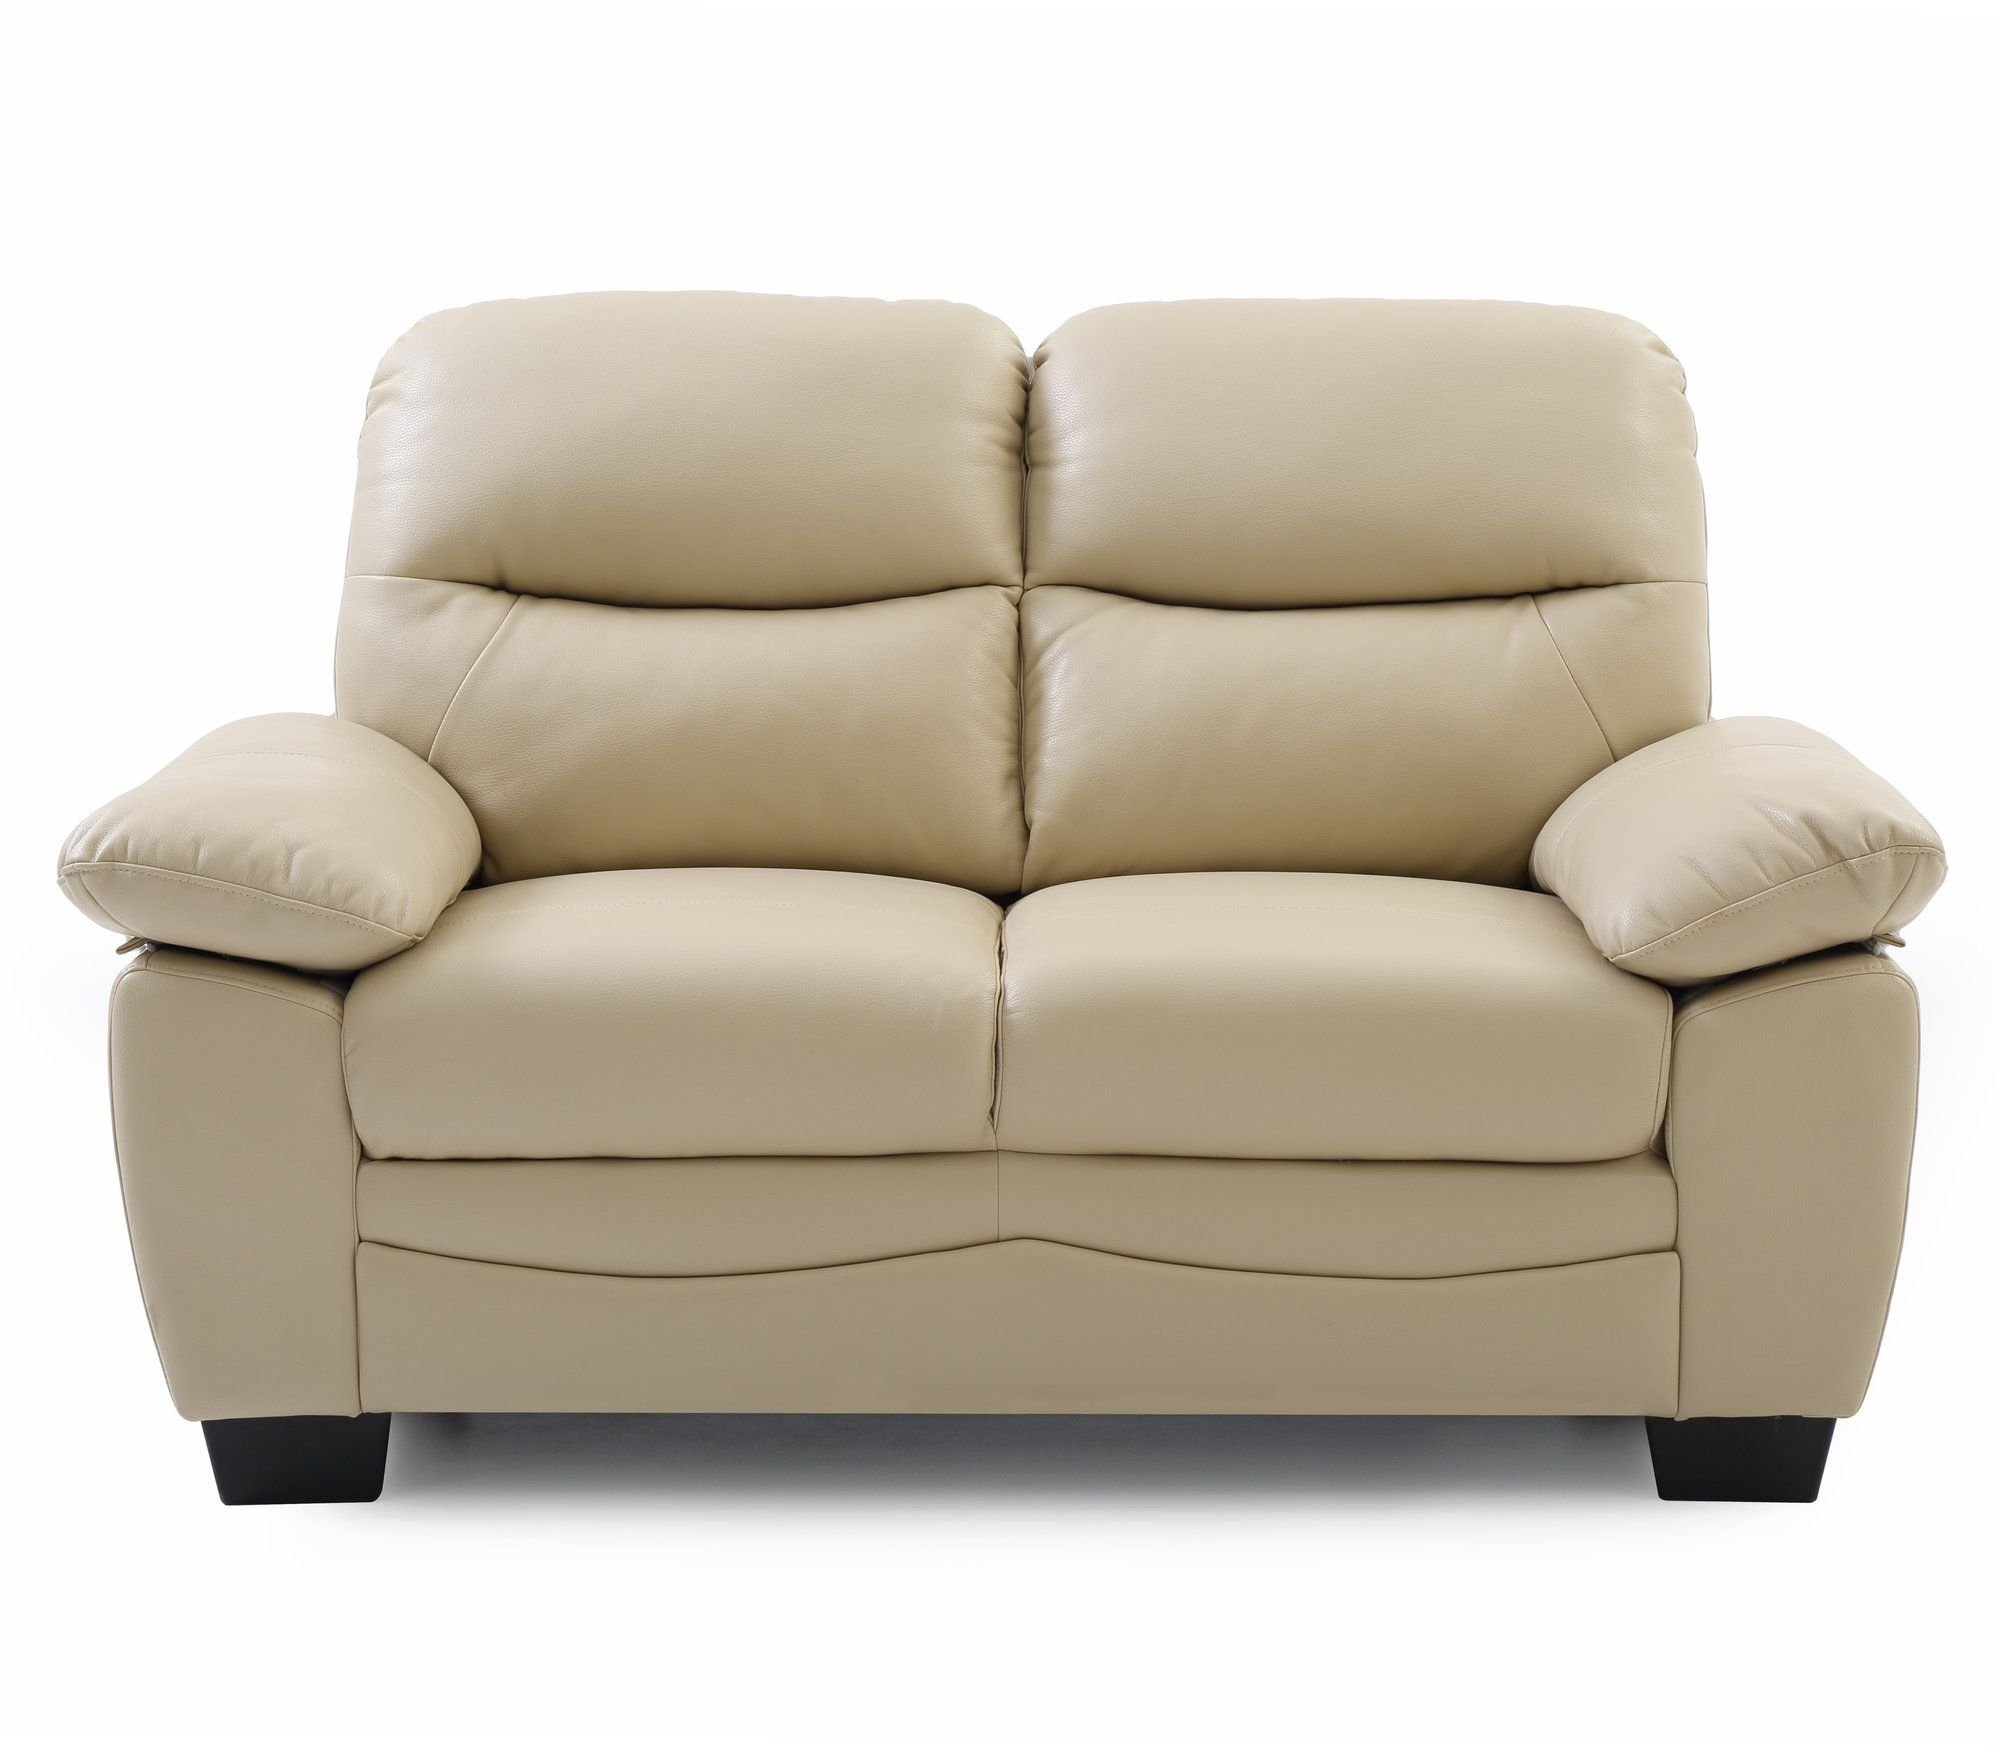 Groovy Mcnabb Loveseat Sofa Upholstery Upholstered Furniture Lamtechconsult Wood Chair Design Ideas Lamtechconsultcom